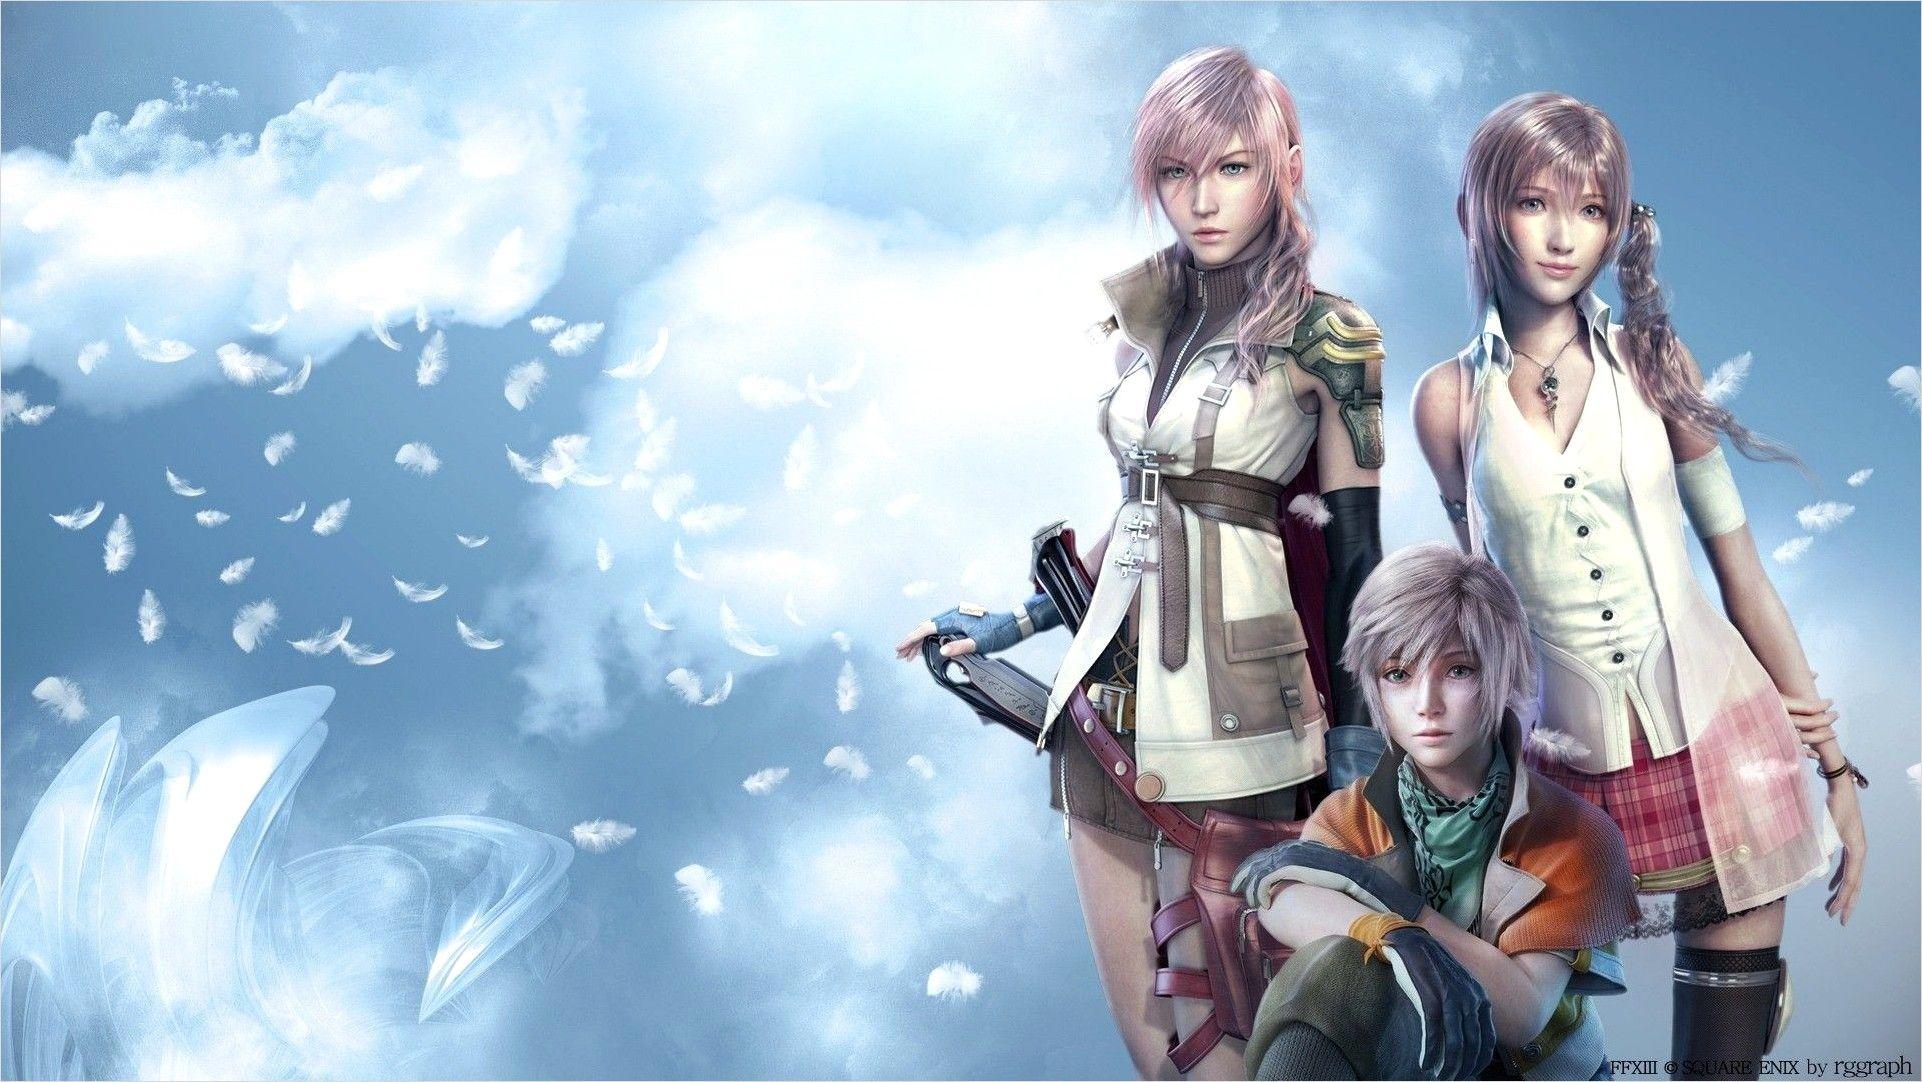 4k Final Fantasy Wallpaper Theme In 2020 Final Fantasy Wallpaper Hd Final Fantasy Xv Wallpapers Final Fantasy